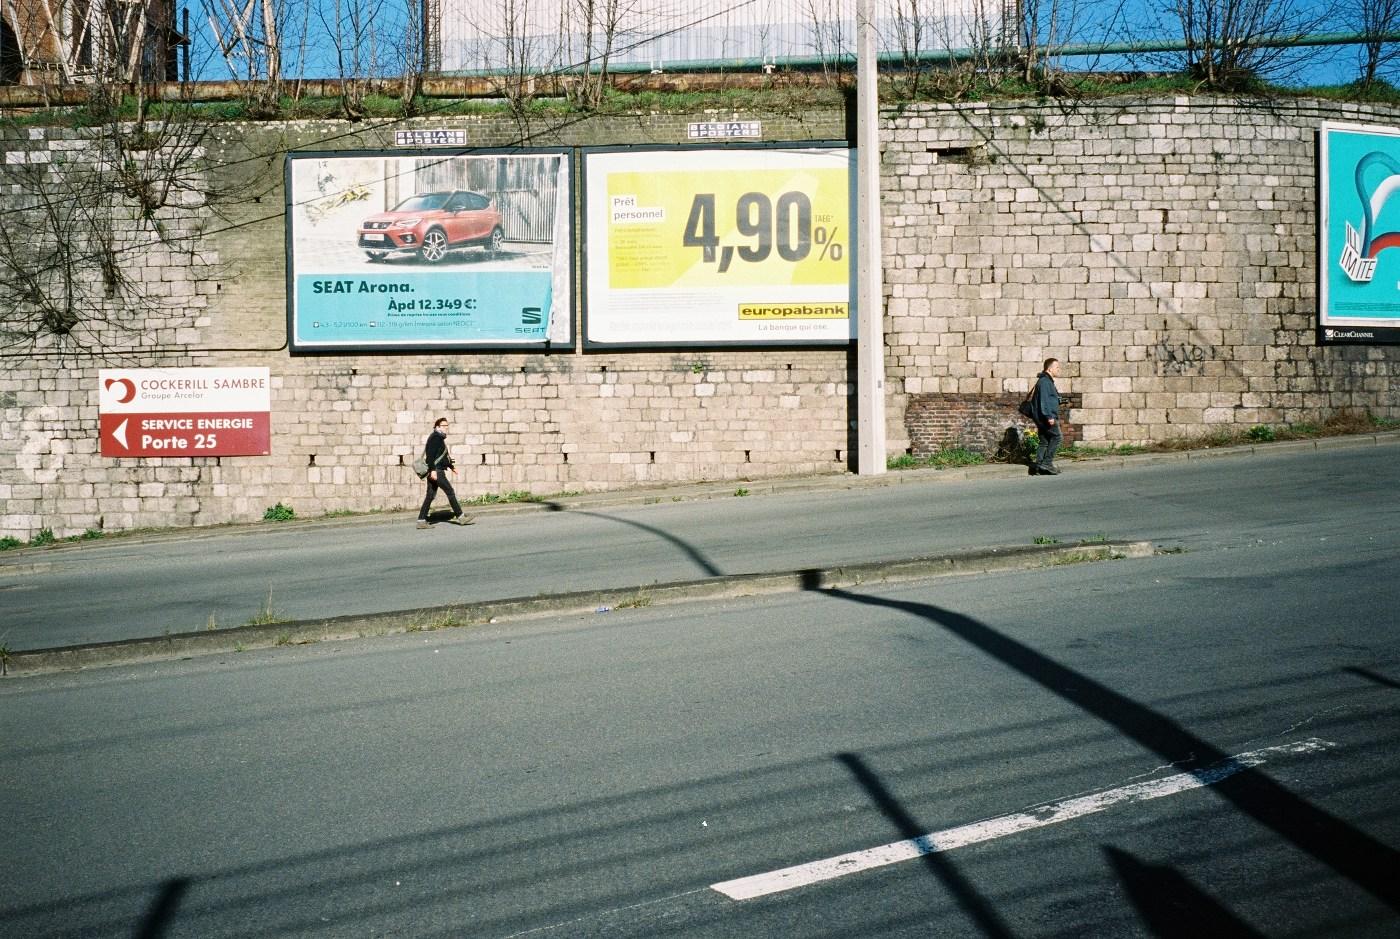 000031JoergBergs-KodakPortra400-MeinFilmLab-M7-35 (3)